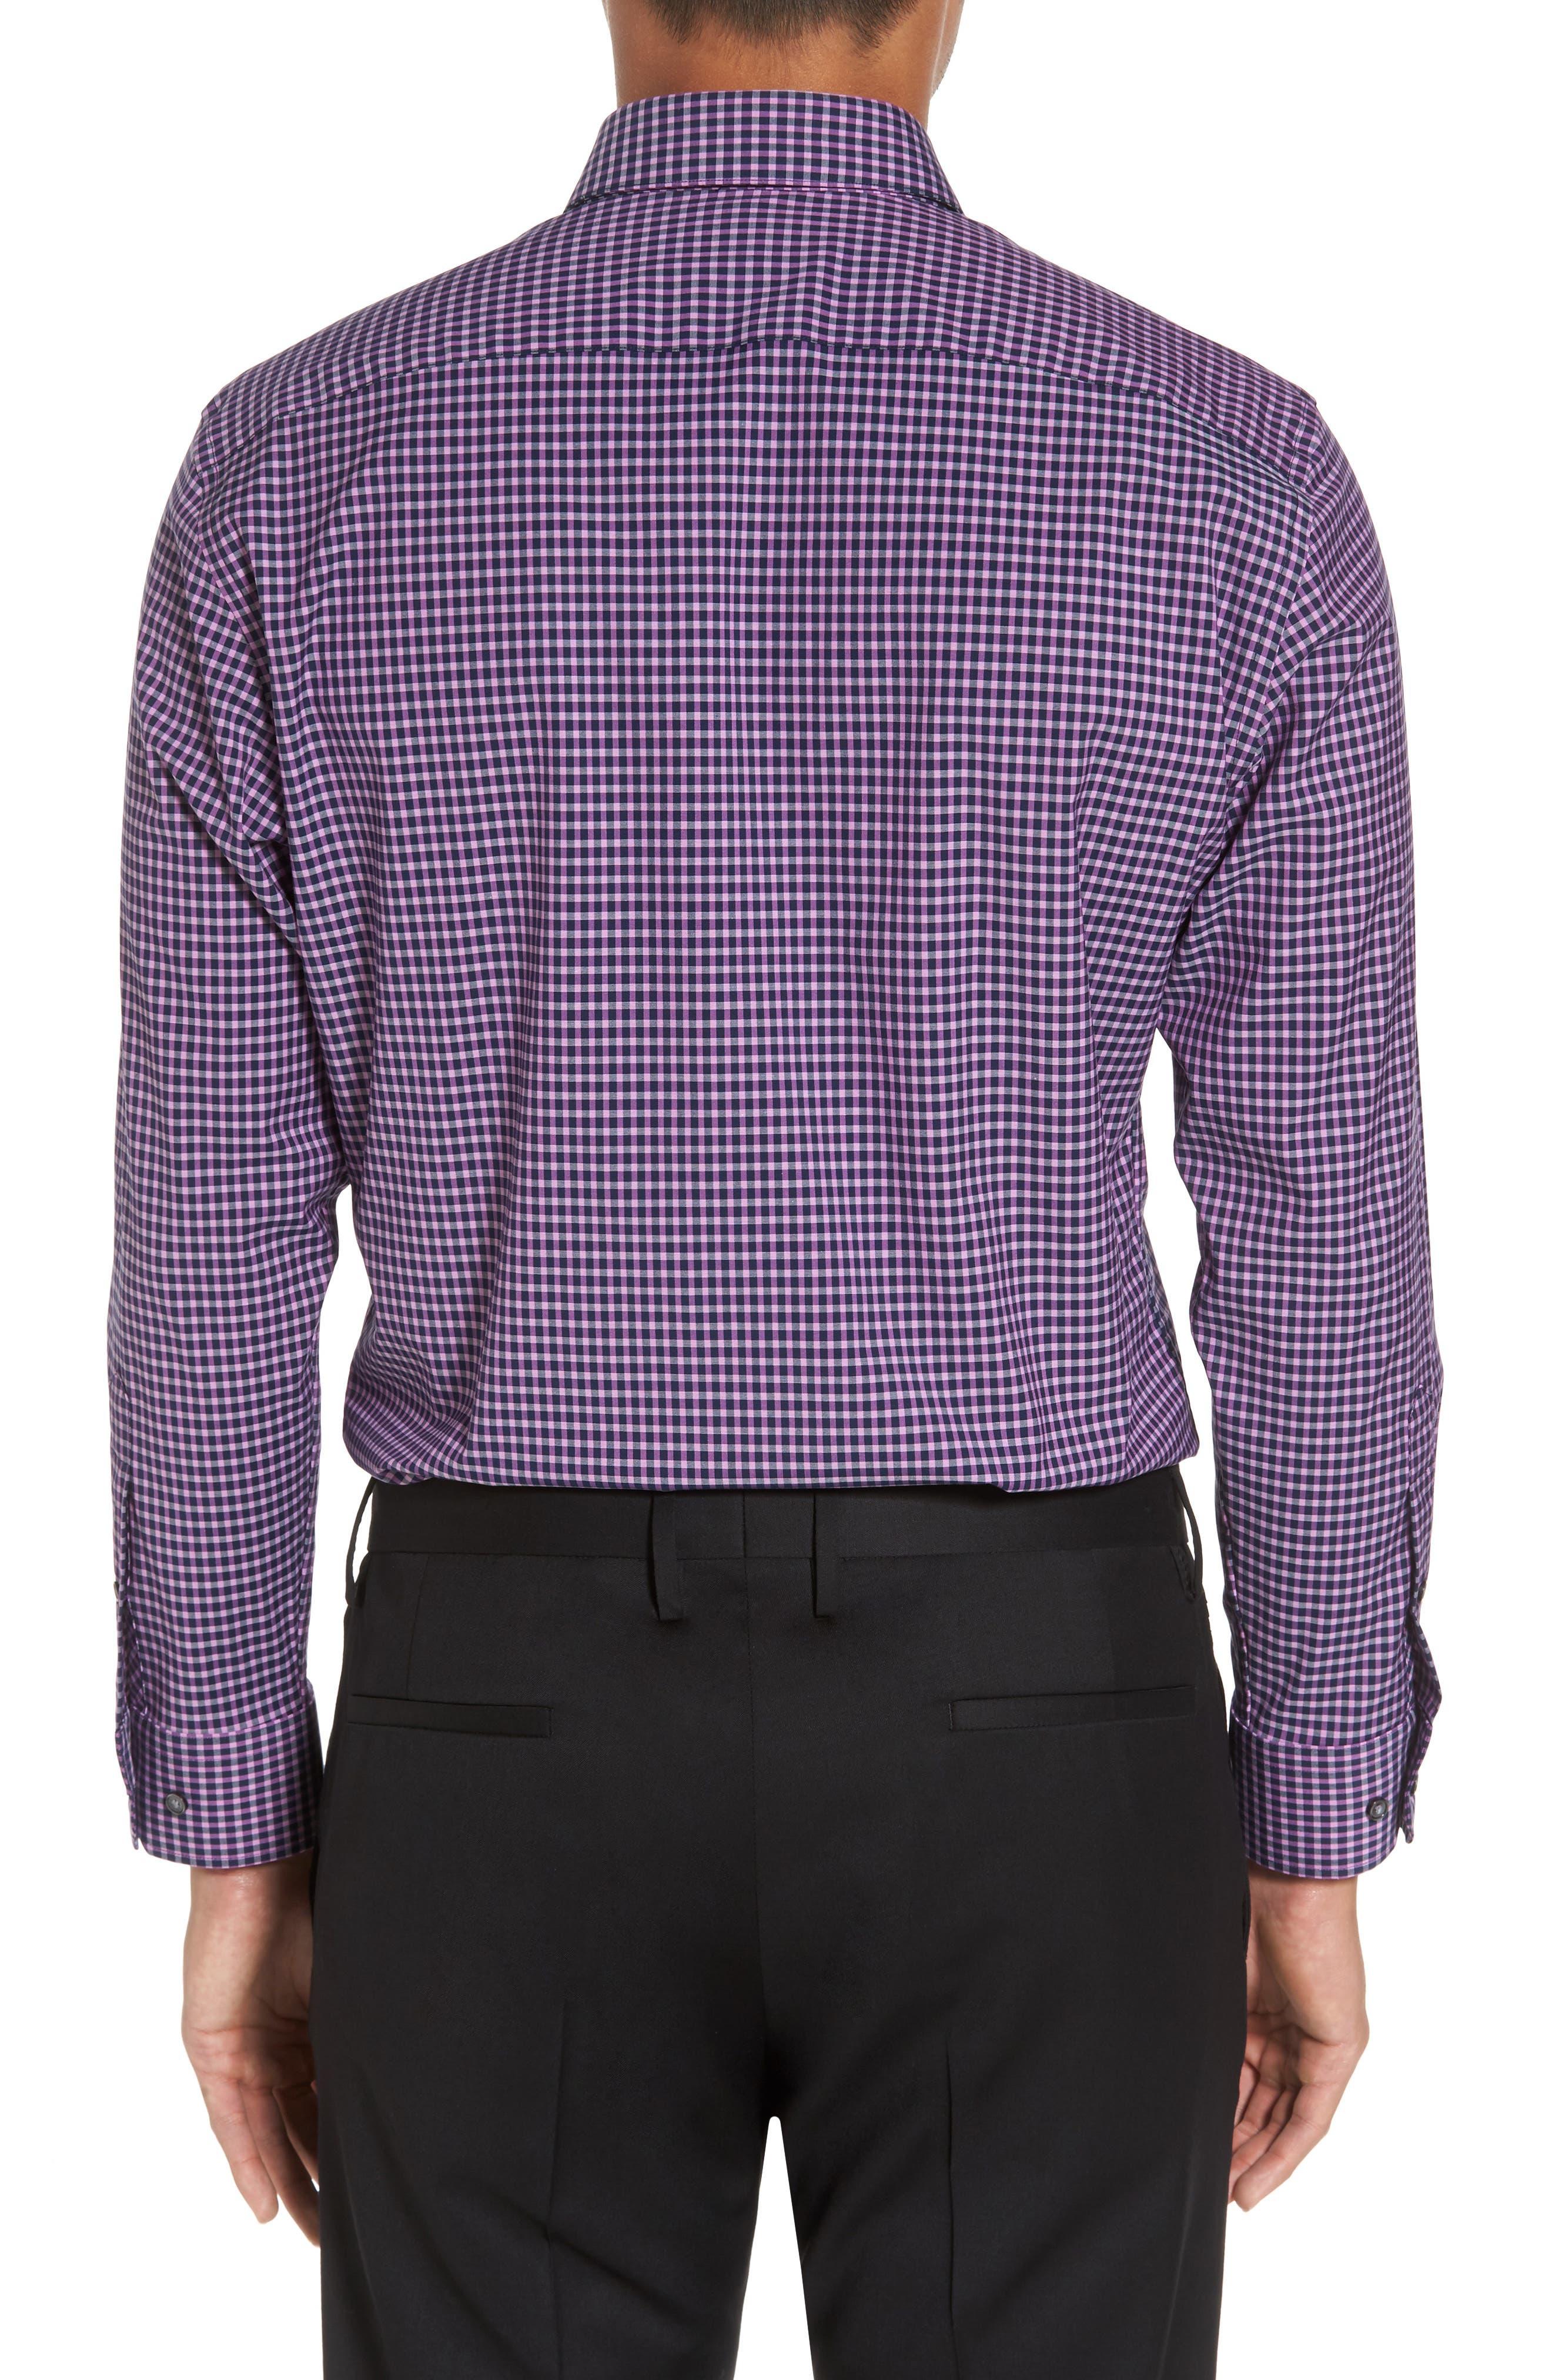 Trim Fit Non-Iron Check Stretch Dress Shirt,                             Alternate thumbnail 3, color,                             Purple Iris